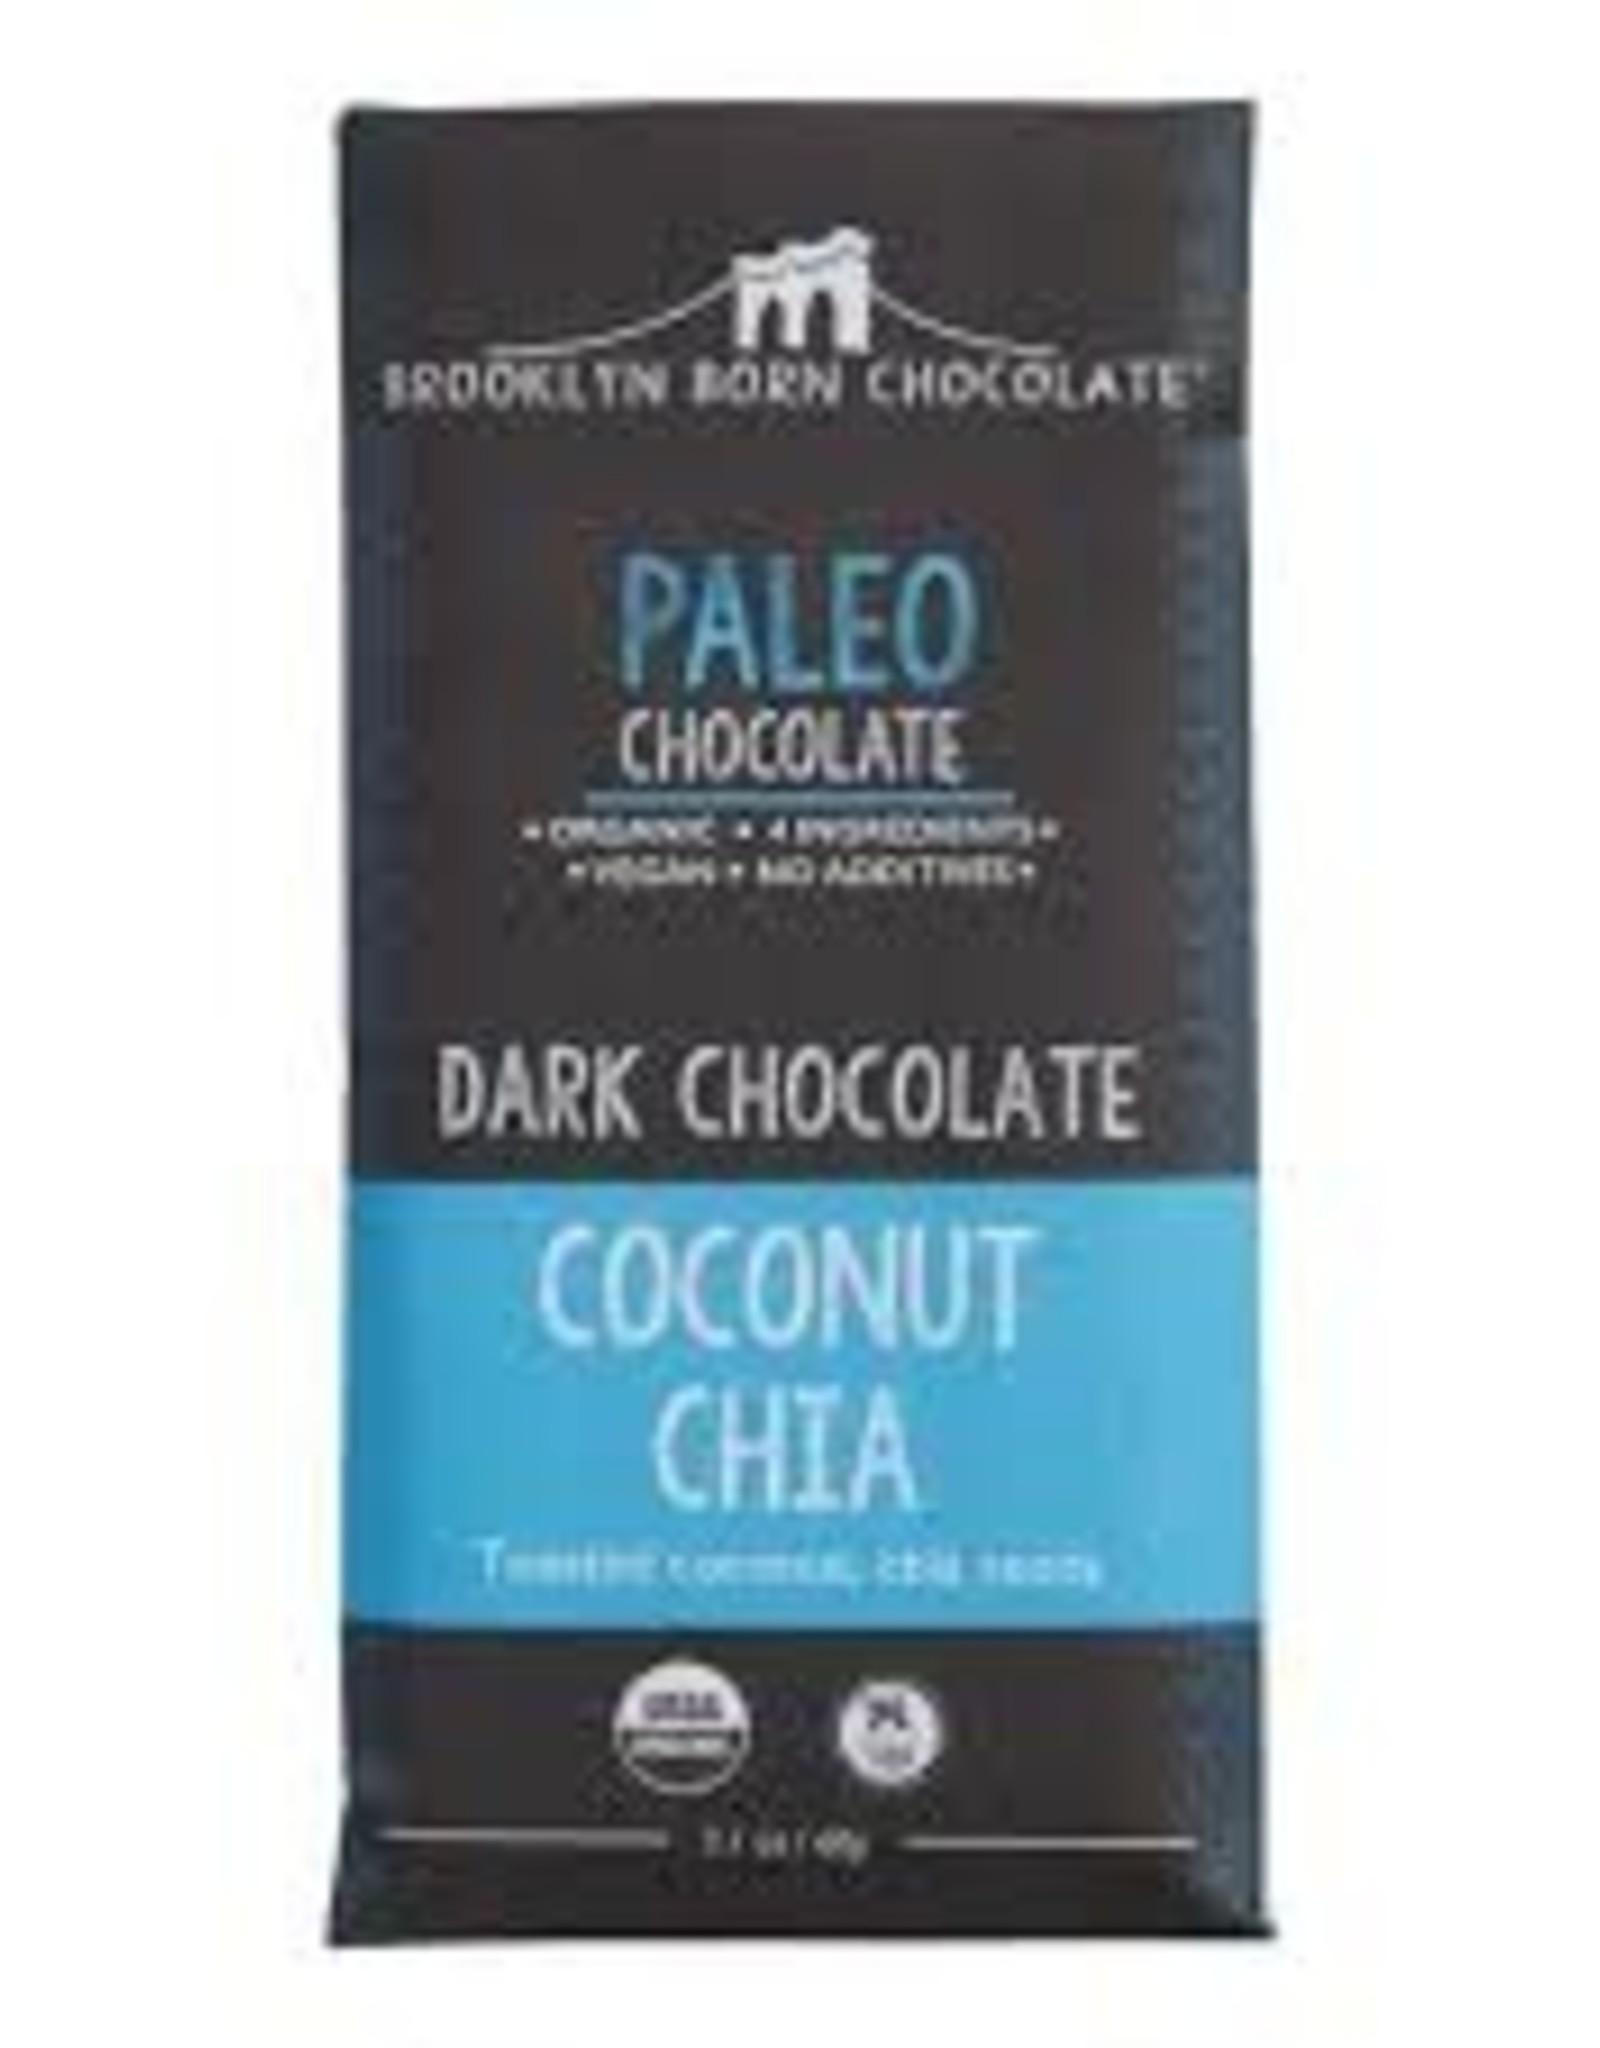 Brooklyn Born Chocolate Brooklyn Born Chocolate - Paleo Bar, Coconut Chia (60g)